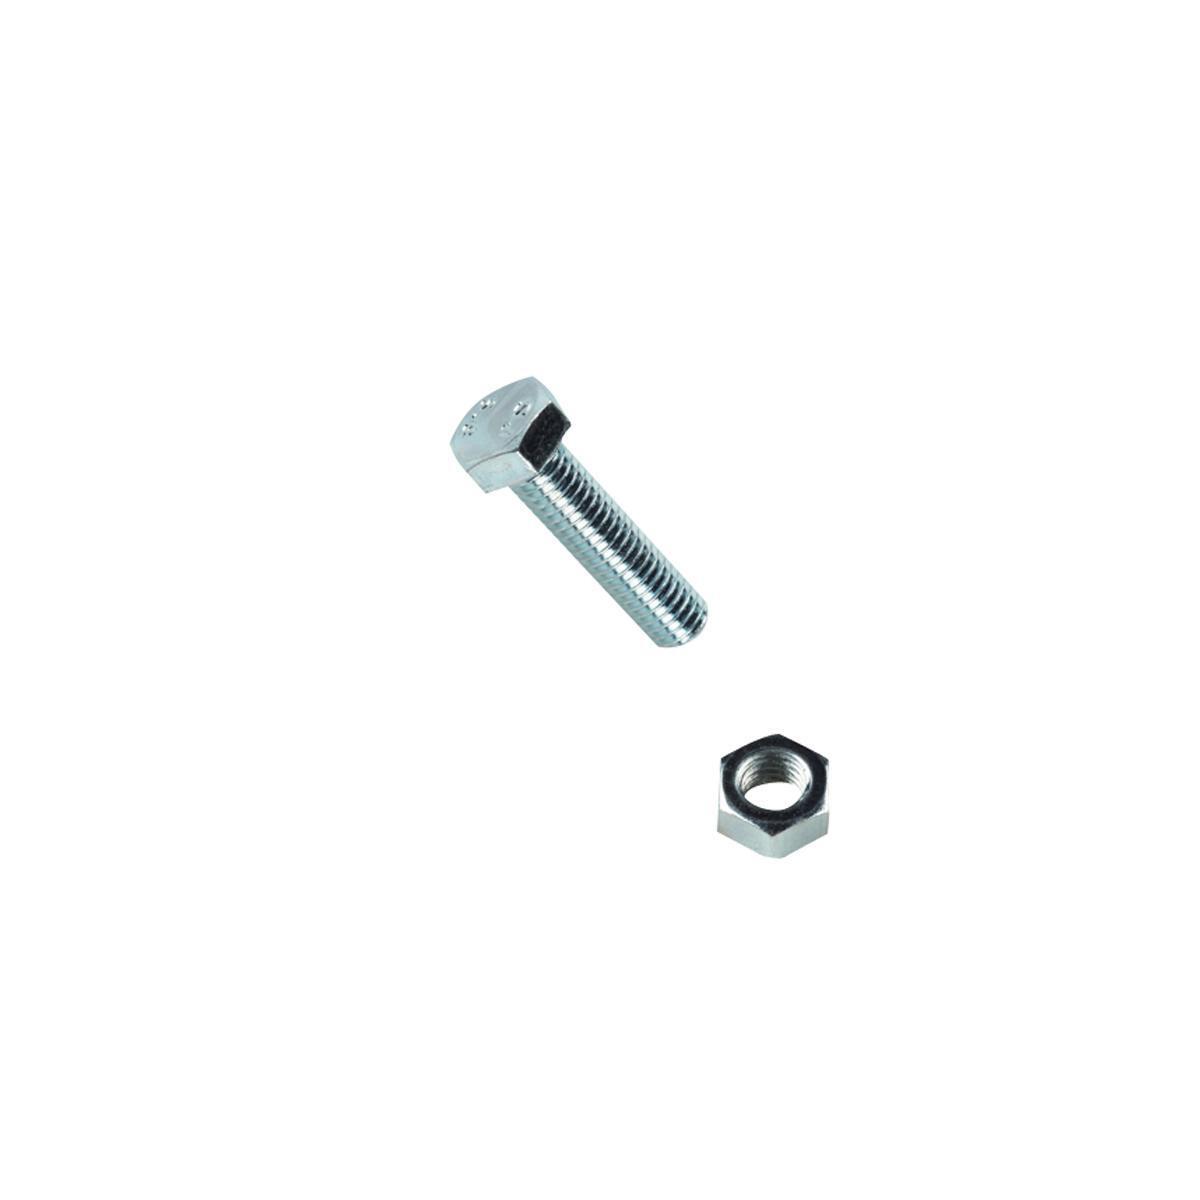 Bullone testa esagonale L 30 x Ø M6 mm, 8 pezzi - 1